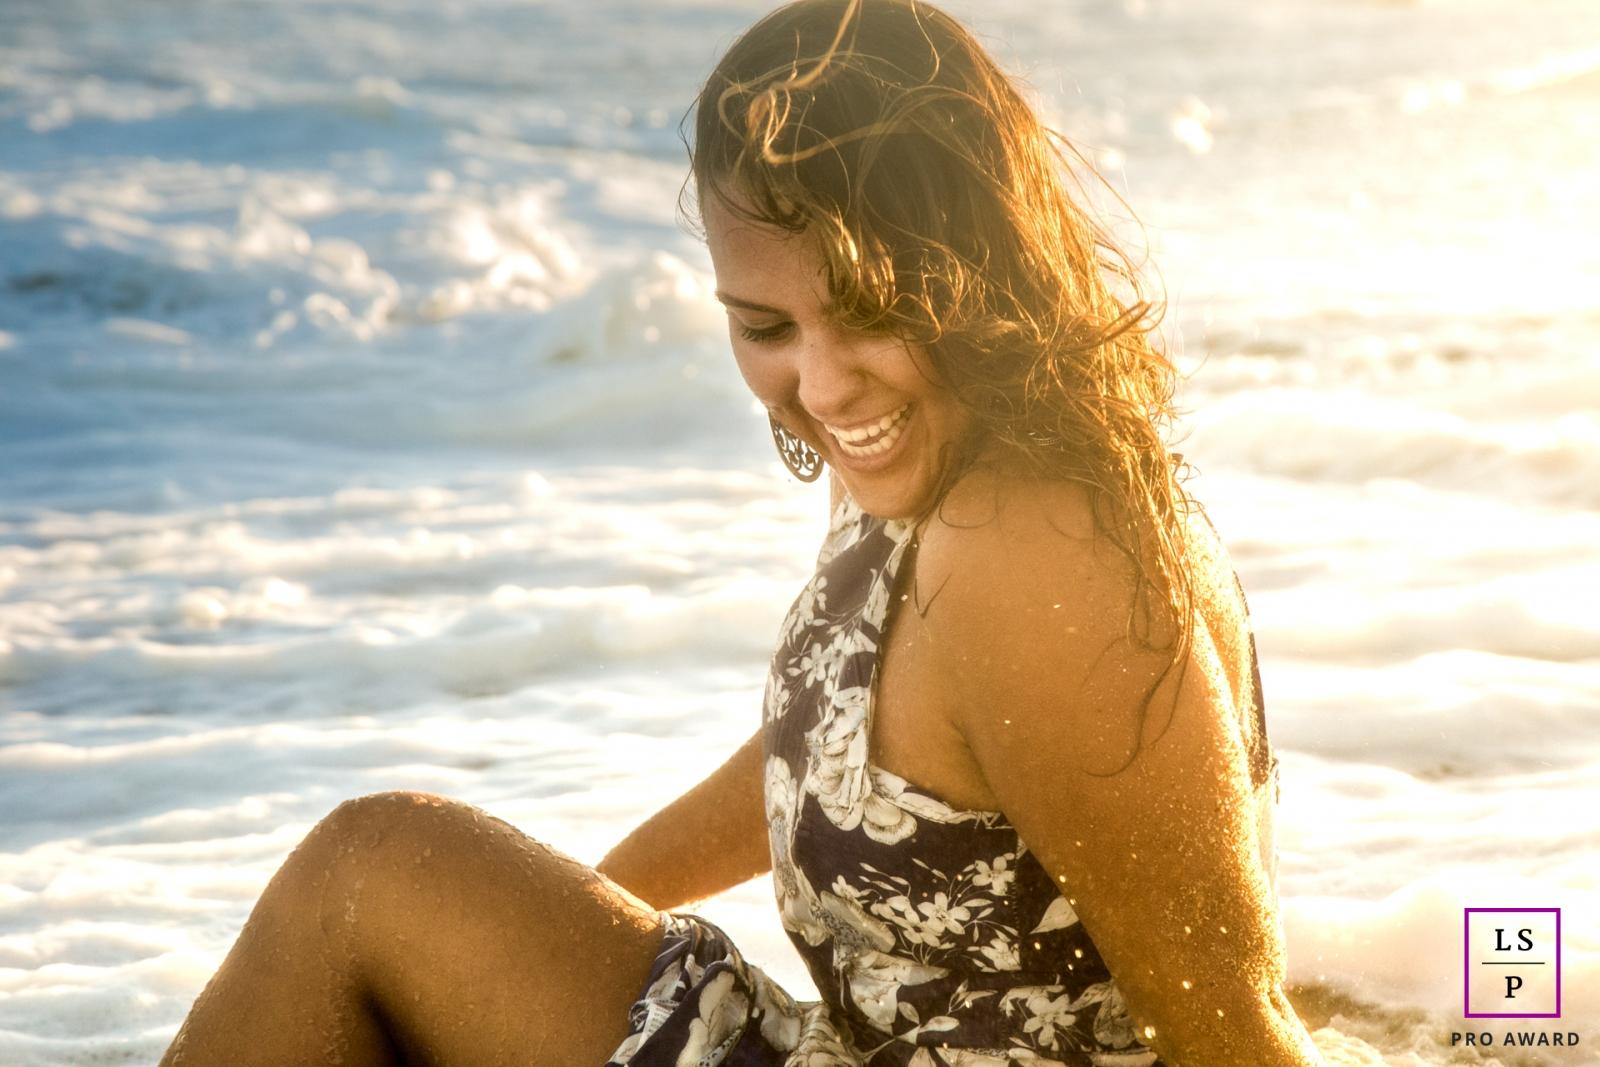 Rio de Janeiro Lifestyle Portraits at the Beach - Photo contains: ocean, woman, wet, color, sunset, gold, light, picture